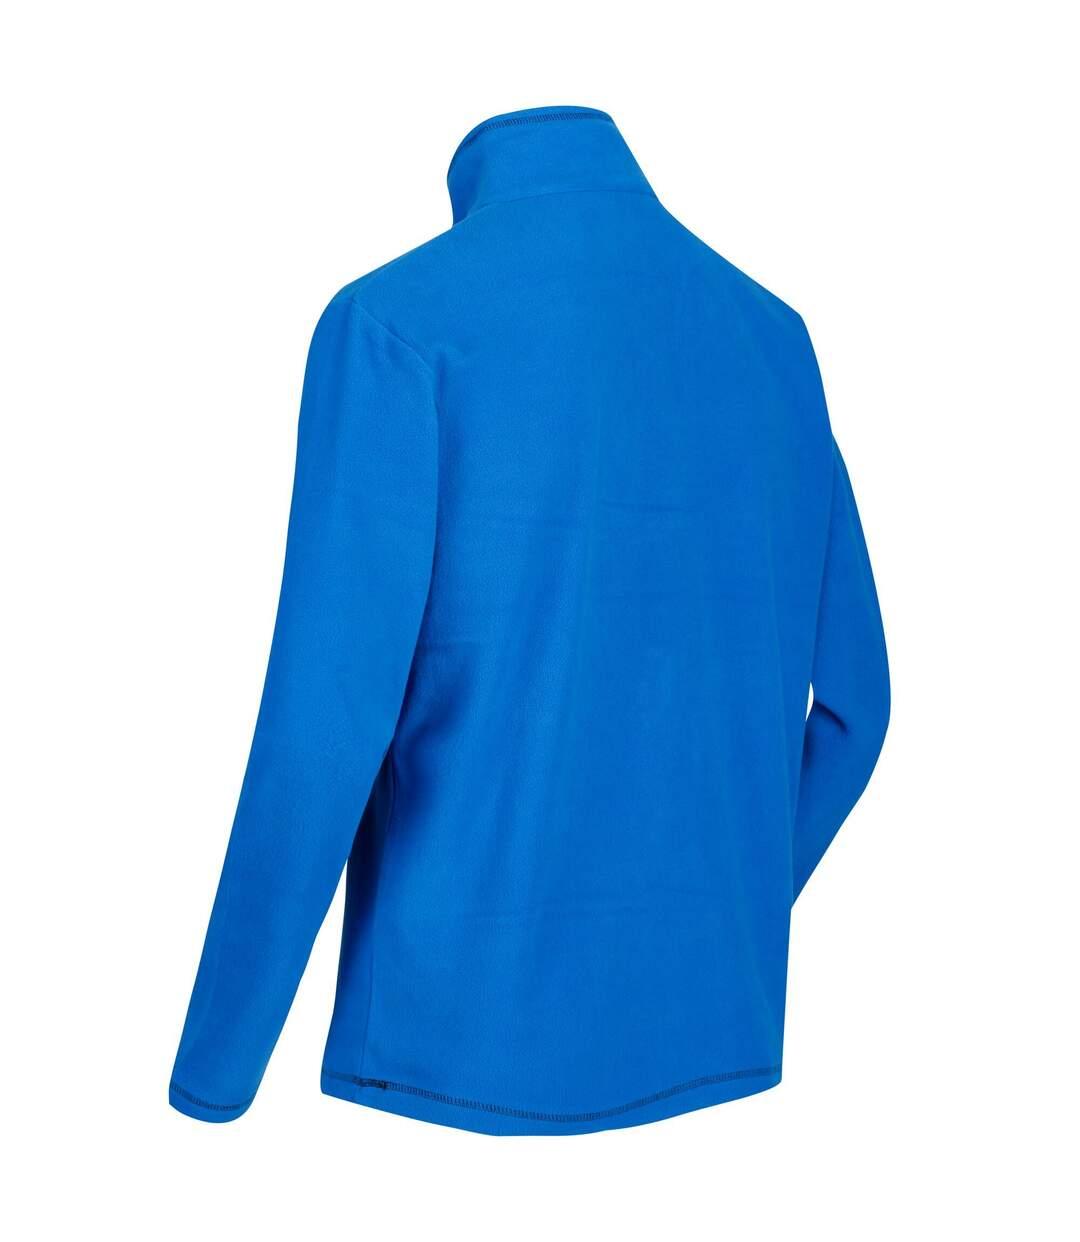 Regatta Great Outdoors Mens Thompson Half Zip Fleece Top (Oxford Blue) - UTRG1390